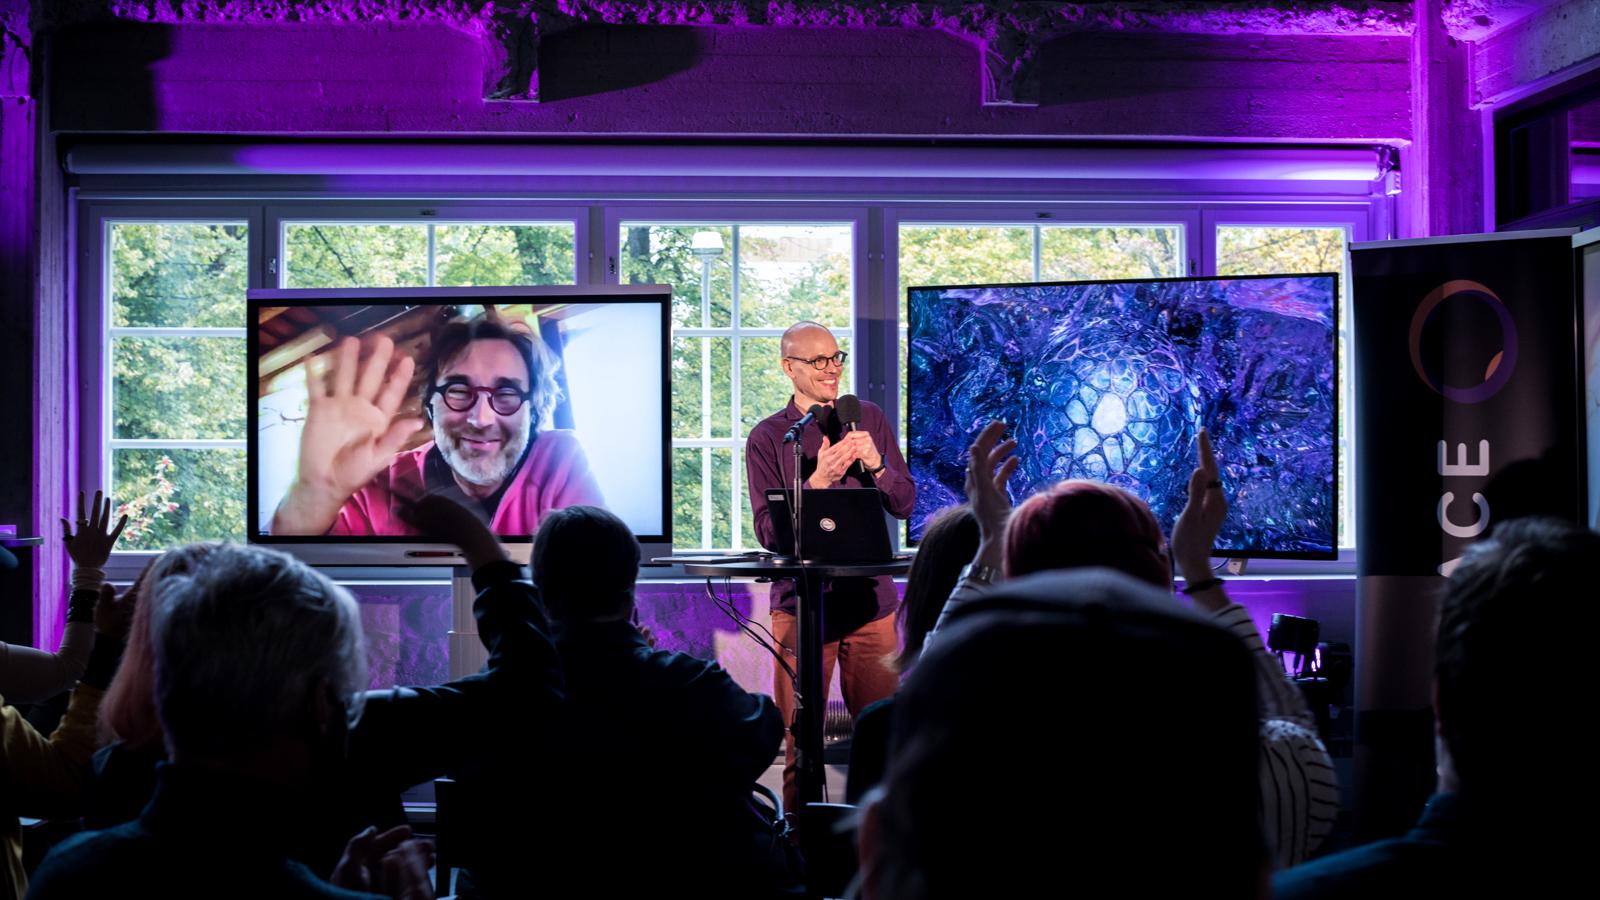 Erik Söderblom on a screen at Embrace Festival 2021. Photo: Lauri Tiainen.